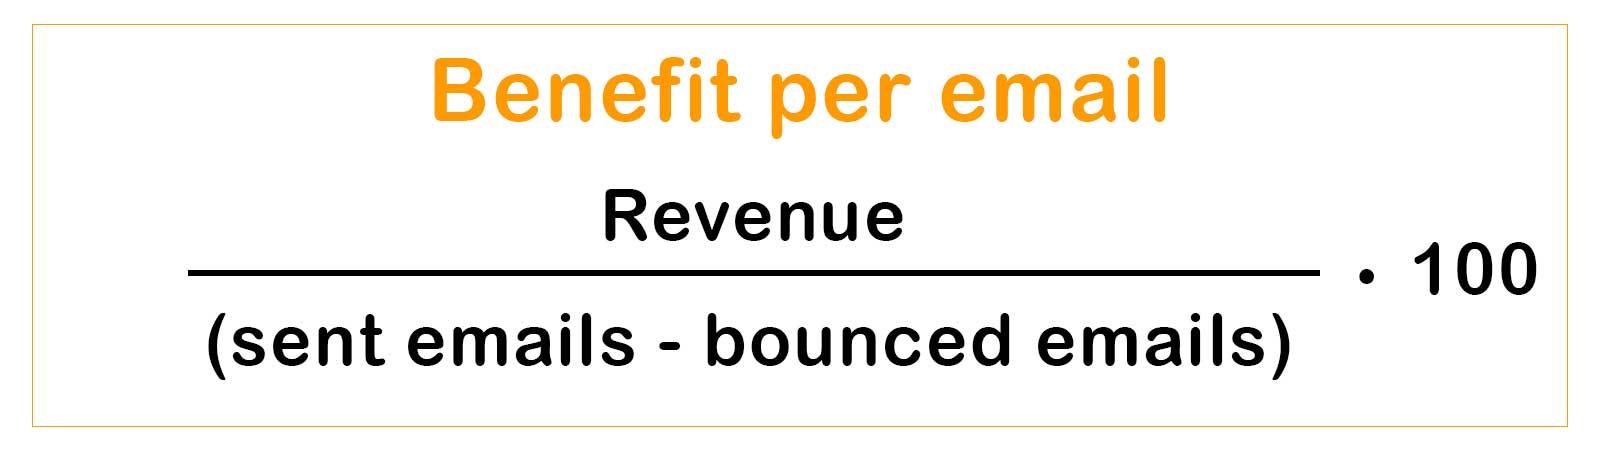 Benefit per email